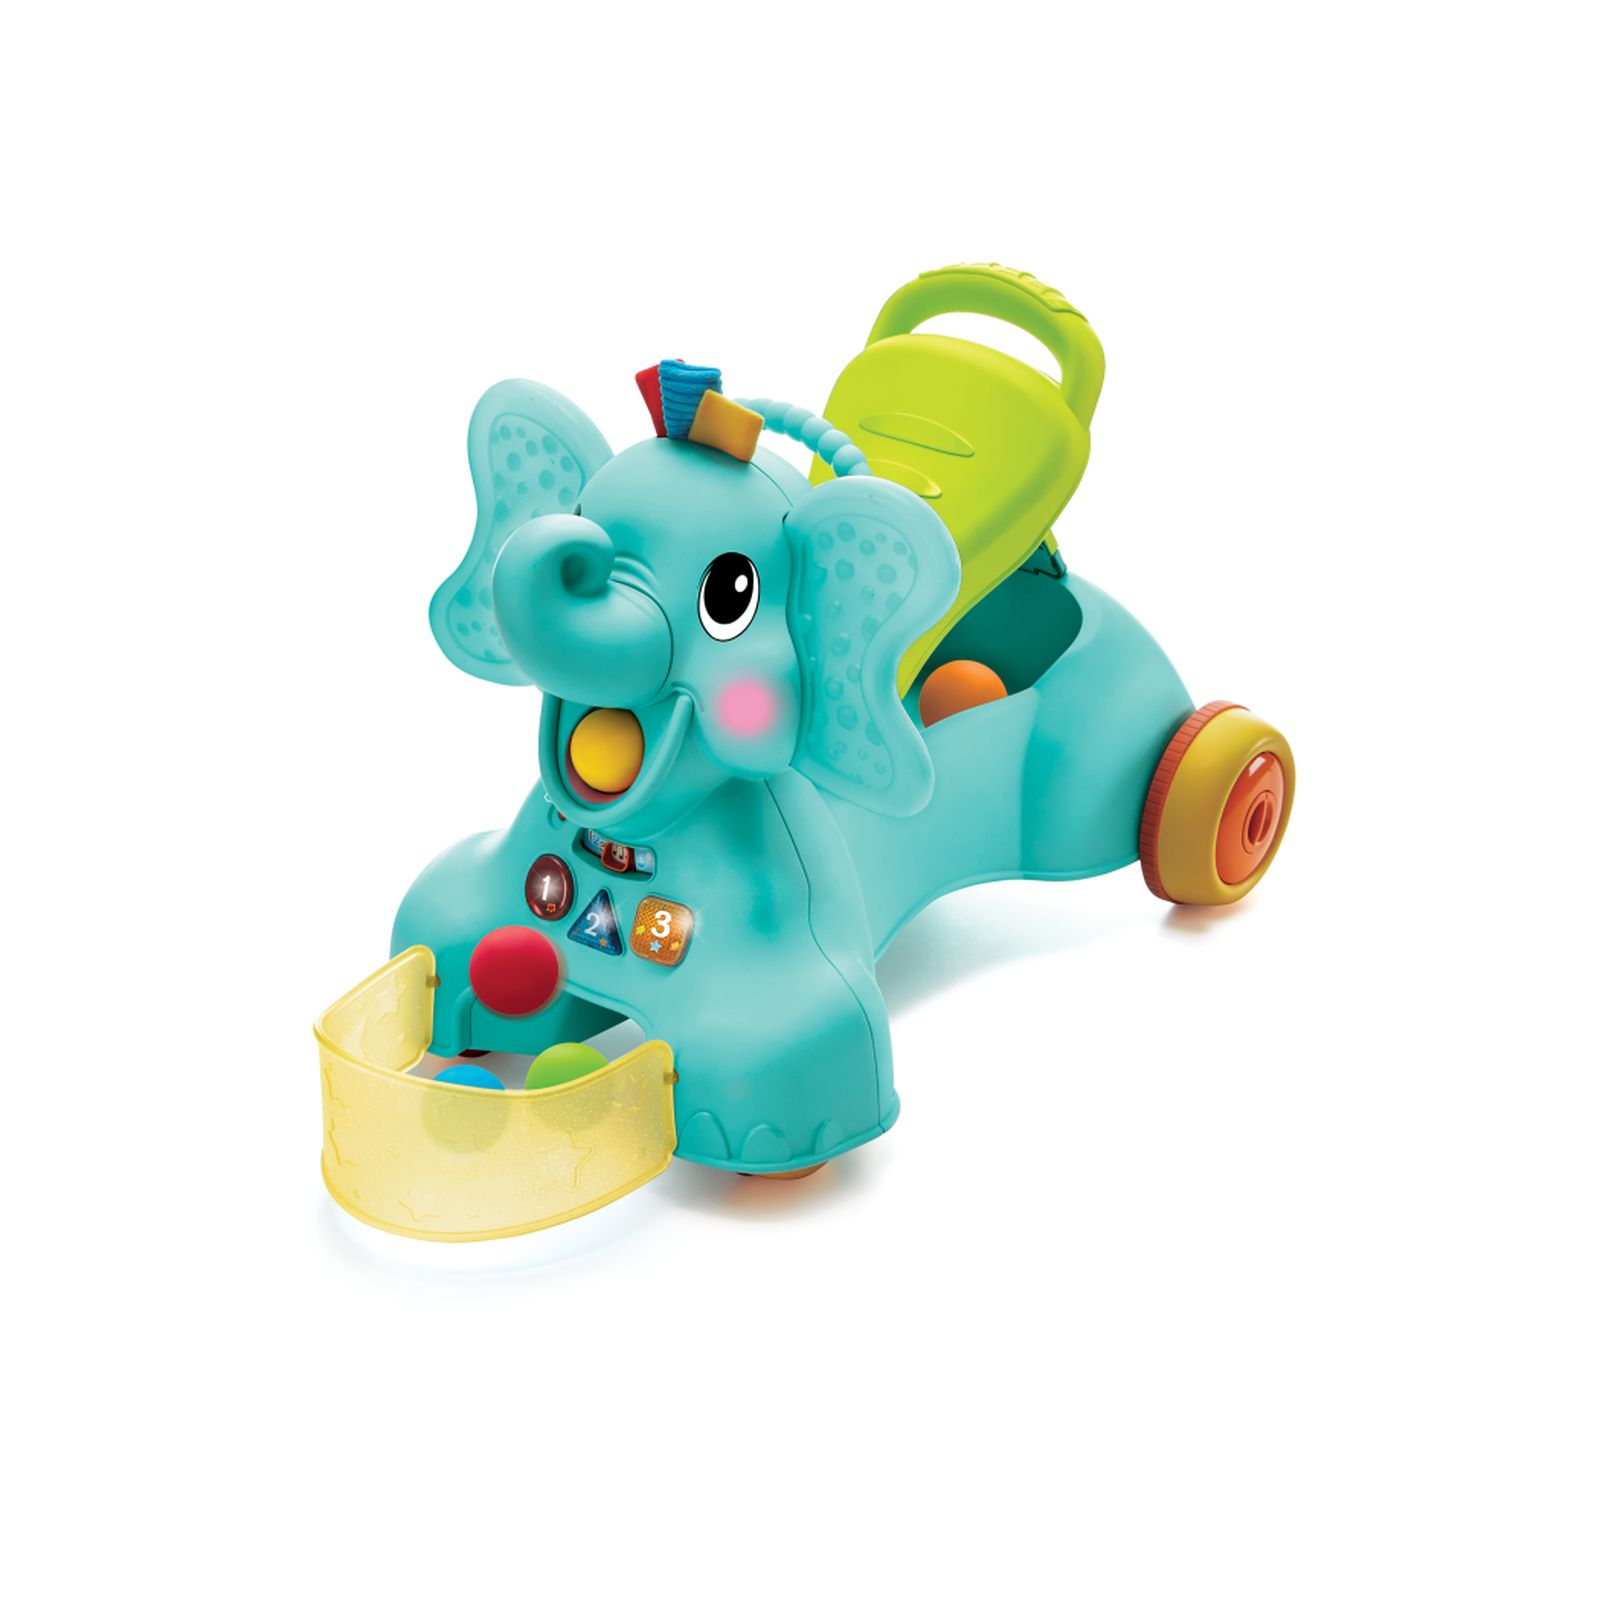 Elefante ride-on 3 in 1 - SUPERSTAR